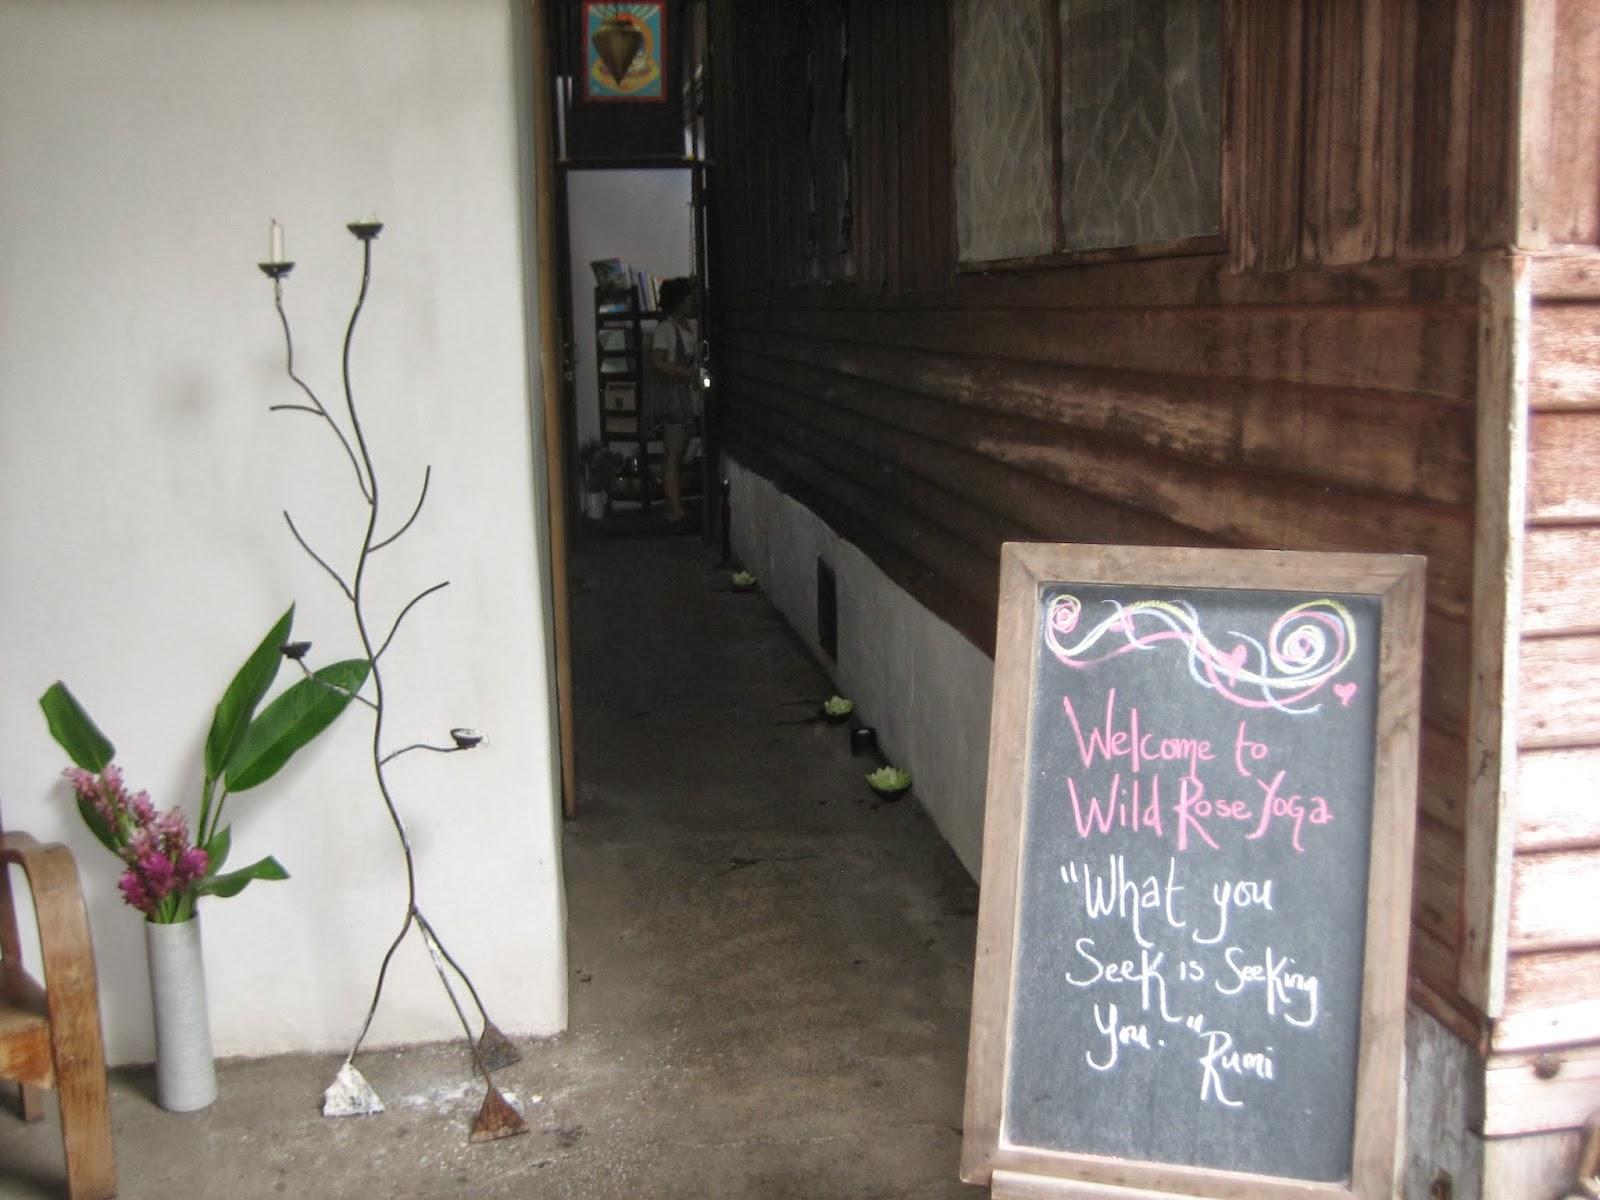 wild-rose-yoga-studio-chiang-mai-thailand